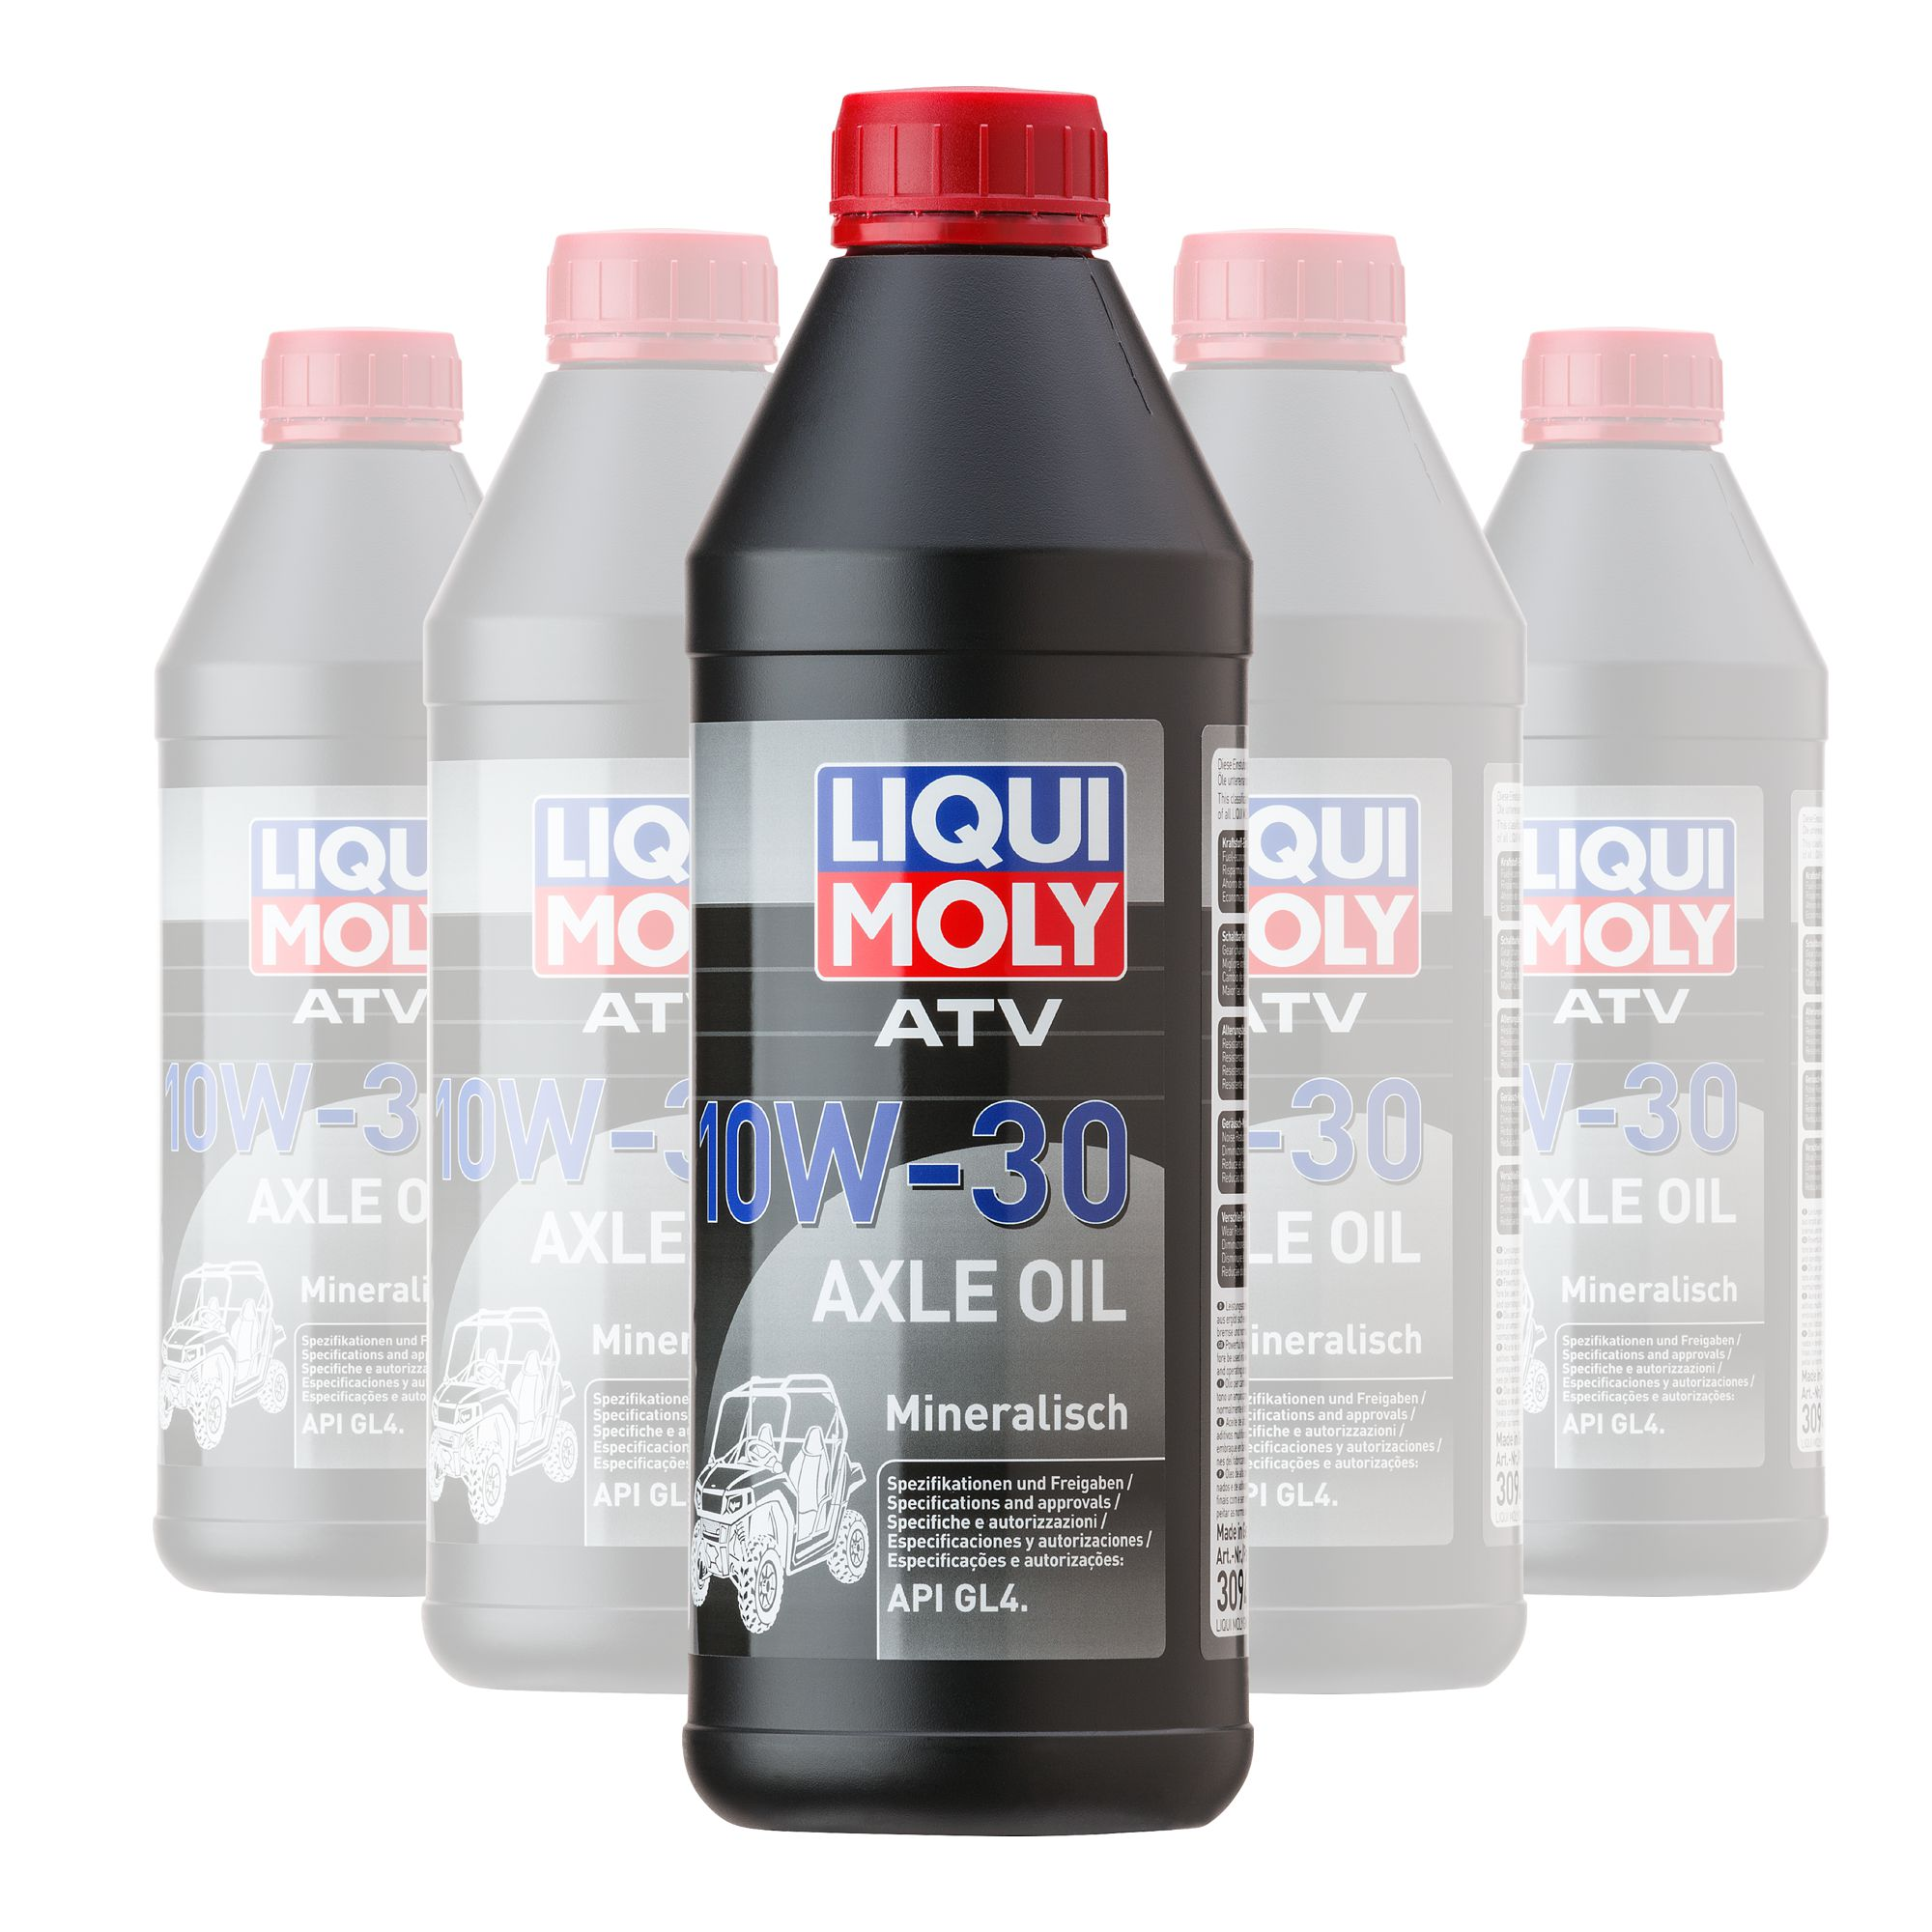 Liquimoly Axle Oil 10W-30 Atv 1L 3094 (Box Qty 6)